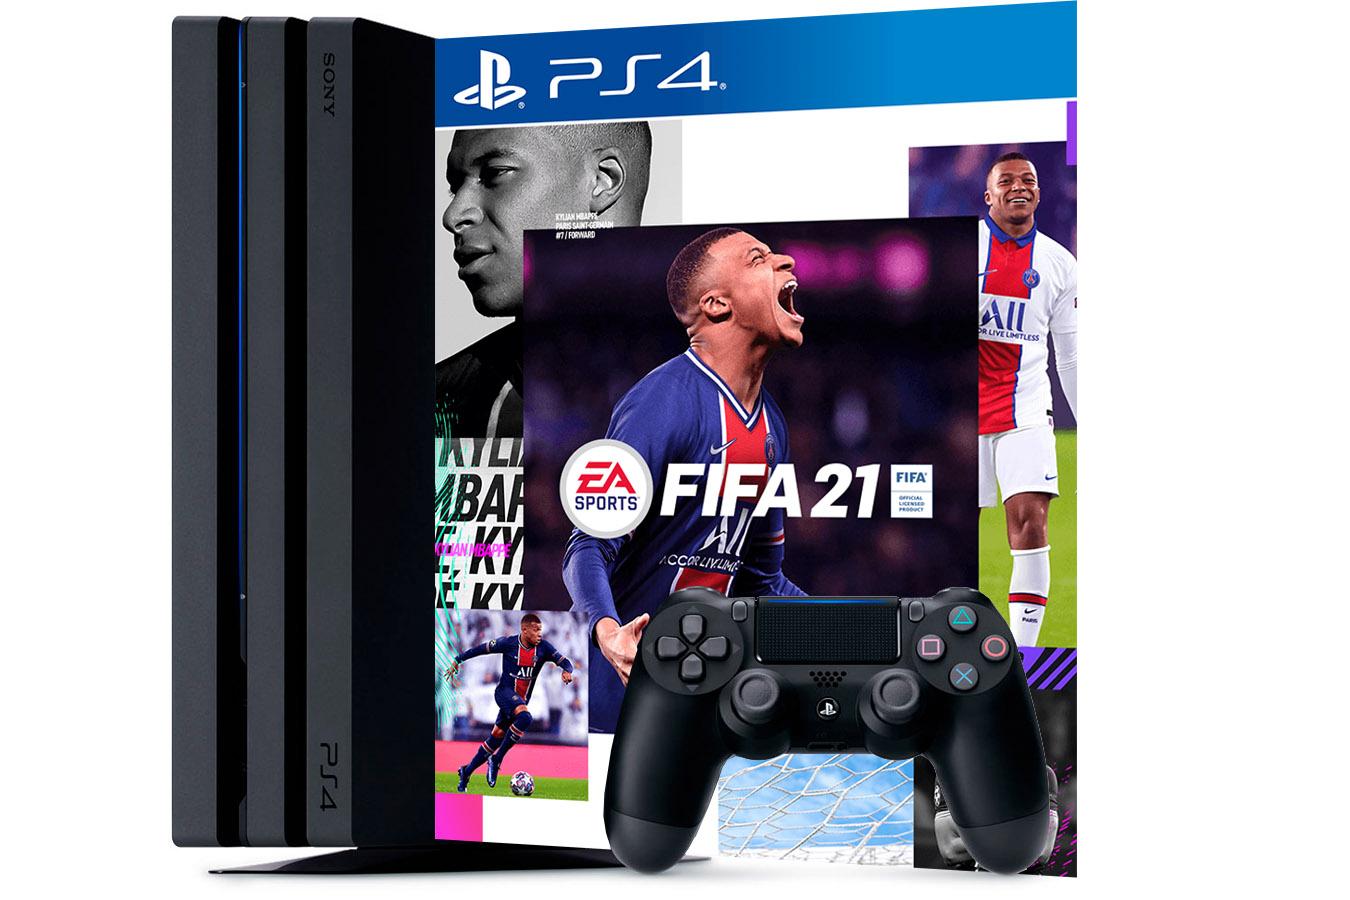 PlayStation 4 Pro приставка с игрой FIFA 21 [PS4P1F21]